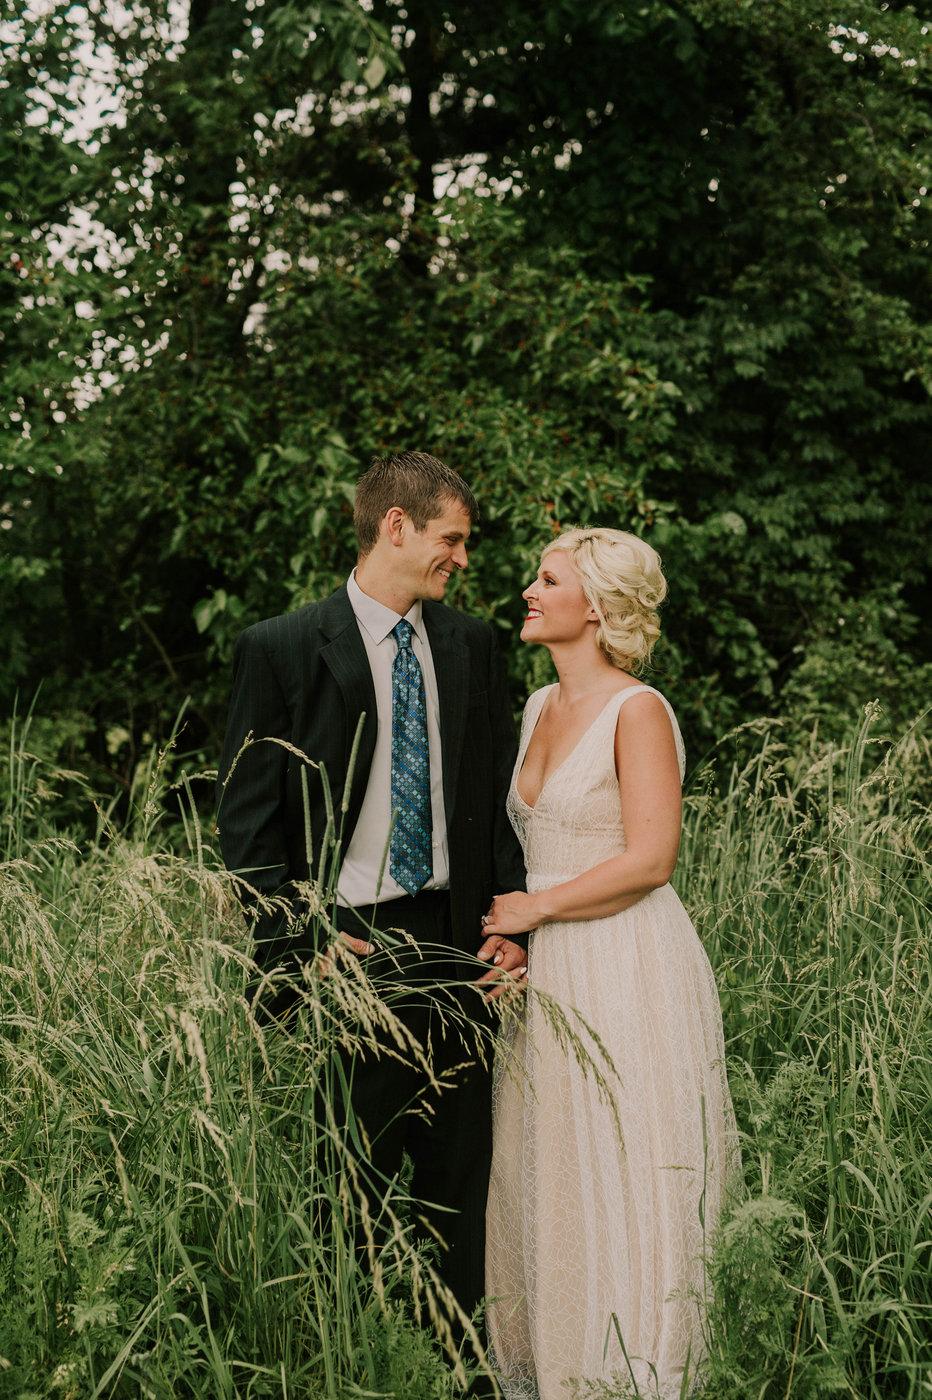 Simple wedding dress  Anna Skoblikova